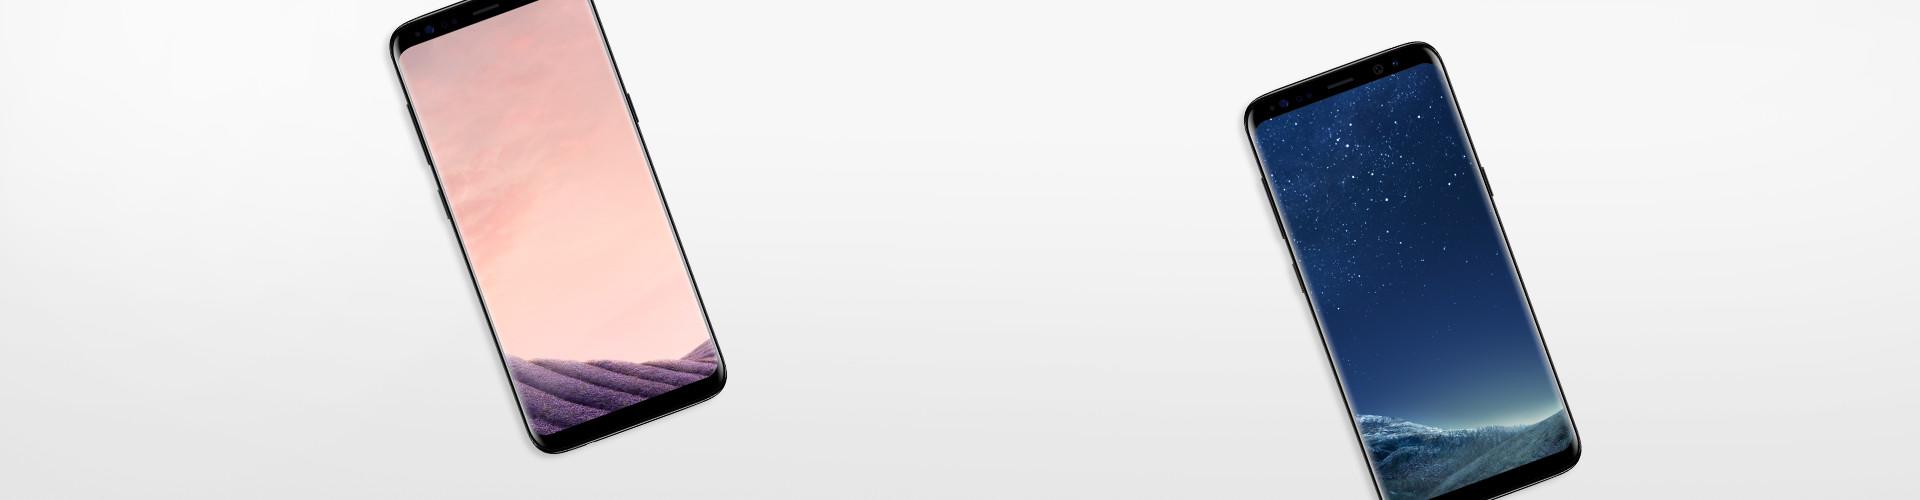 Samsung Galaxy S8 BOGO with ATT